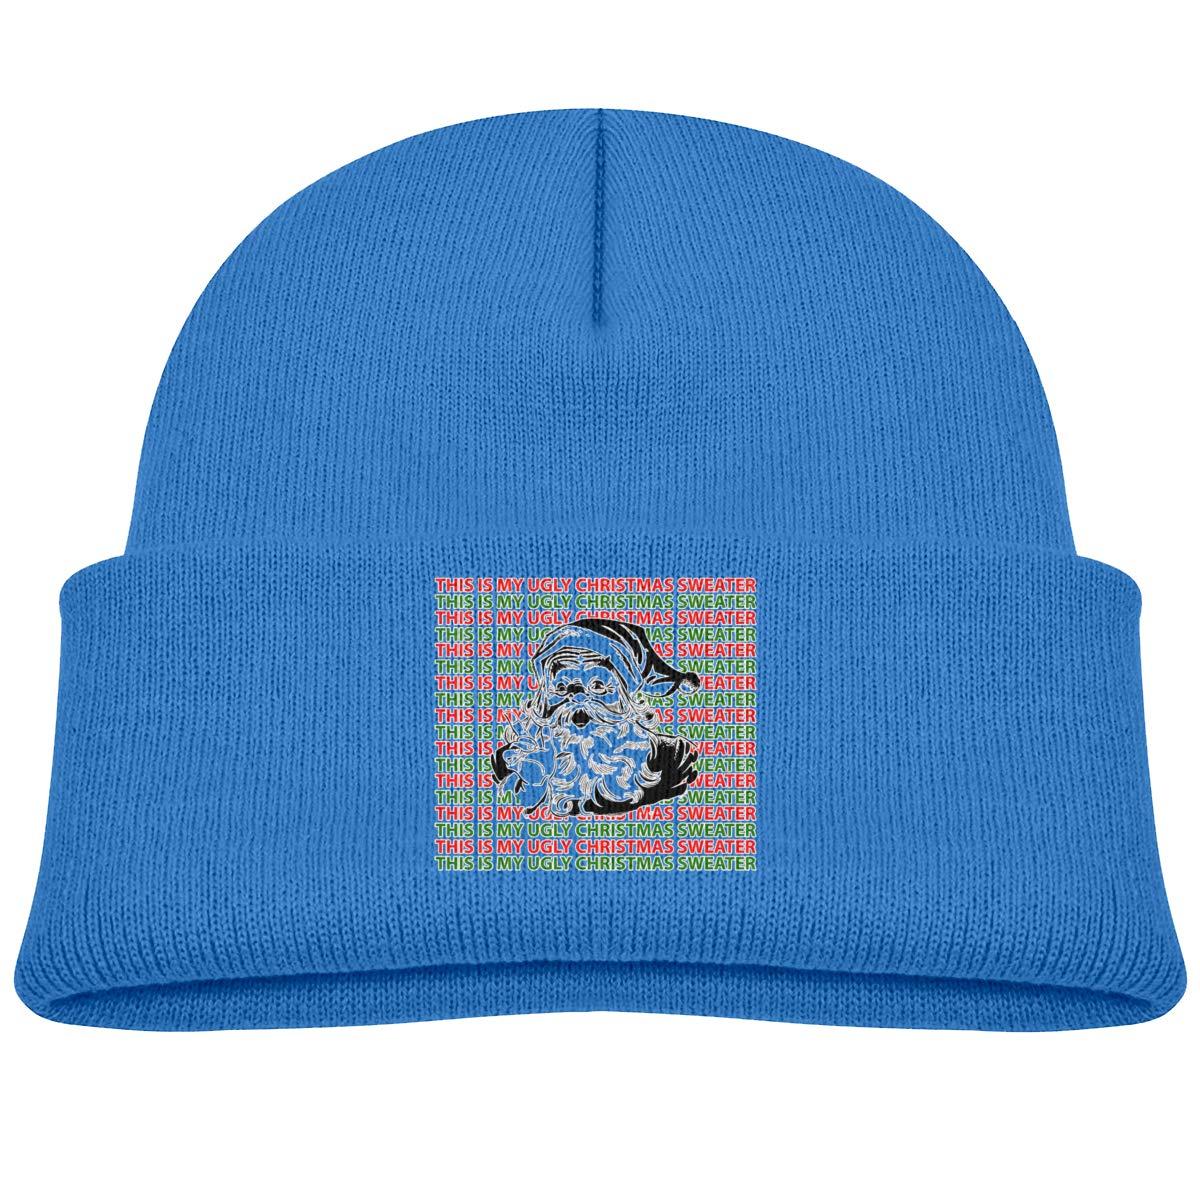 Hanfjj Kefdk Santa Merry Christmas Infant Knit Hats Baby Girl Beanies Cap